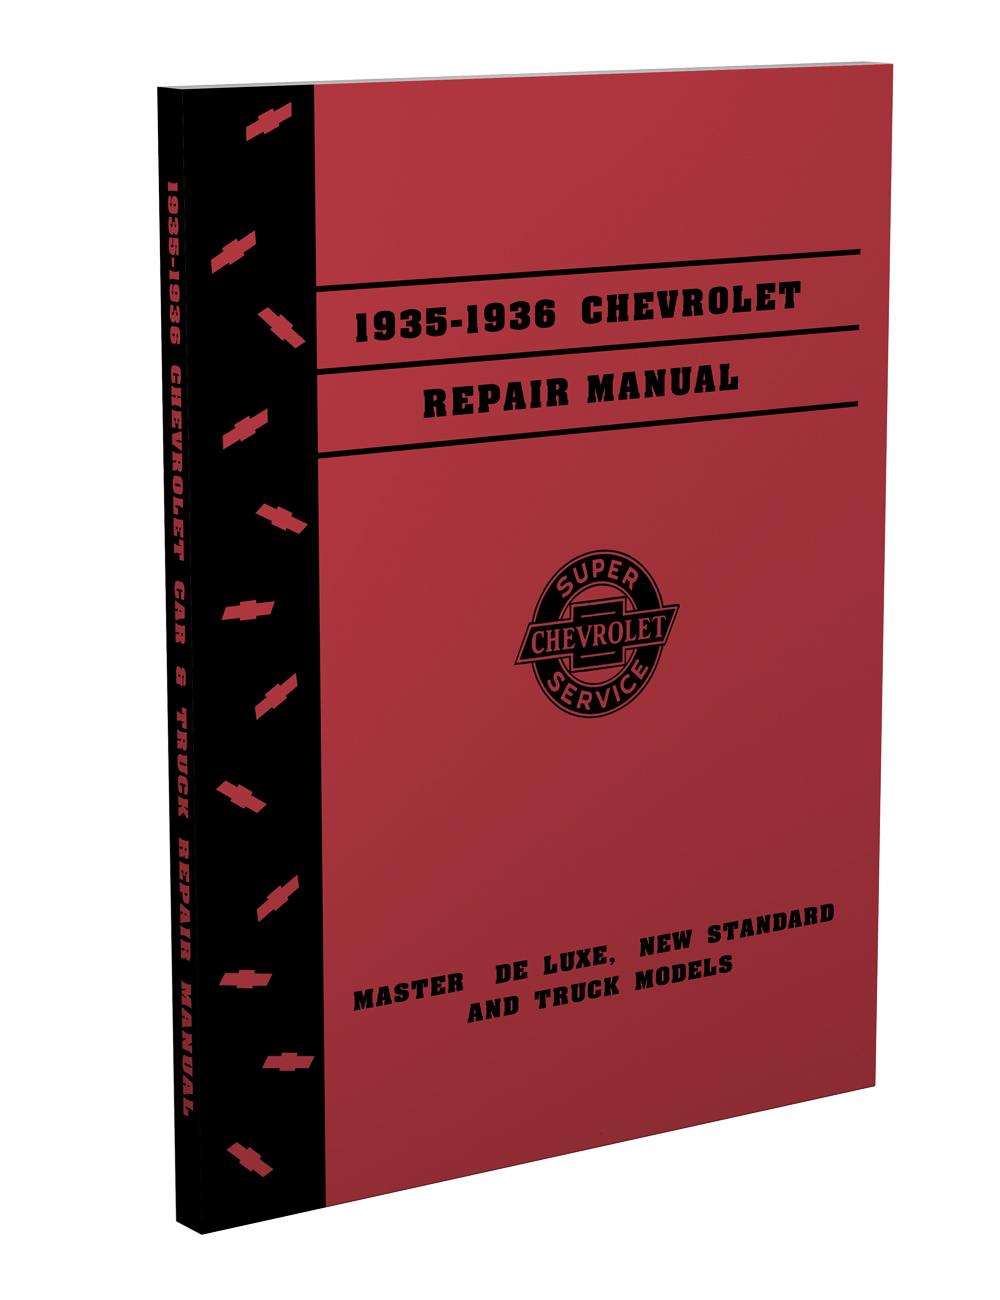 hight resolution of 1935 1936 chevrolet shop manual reprint all models